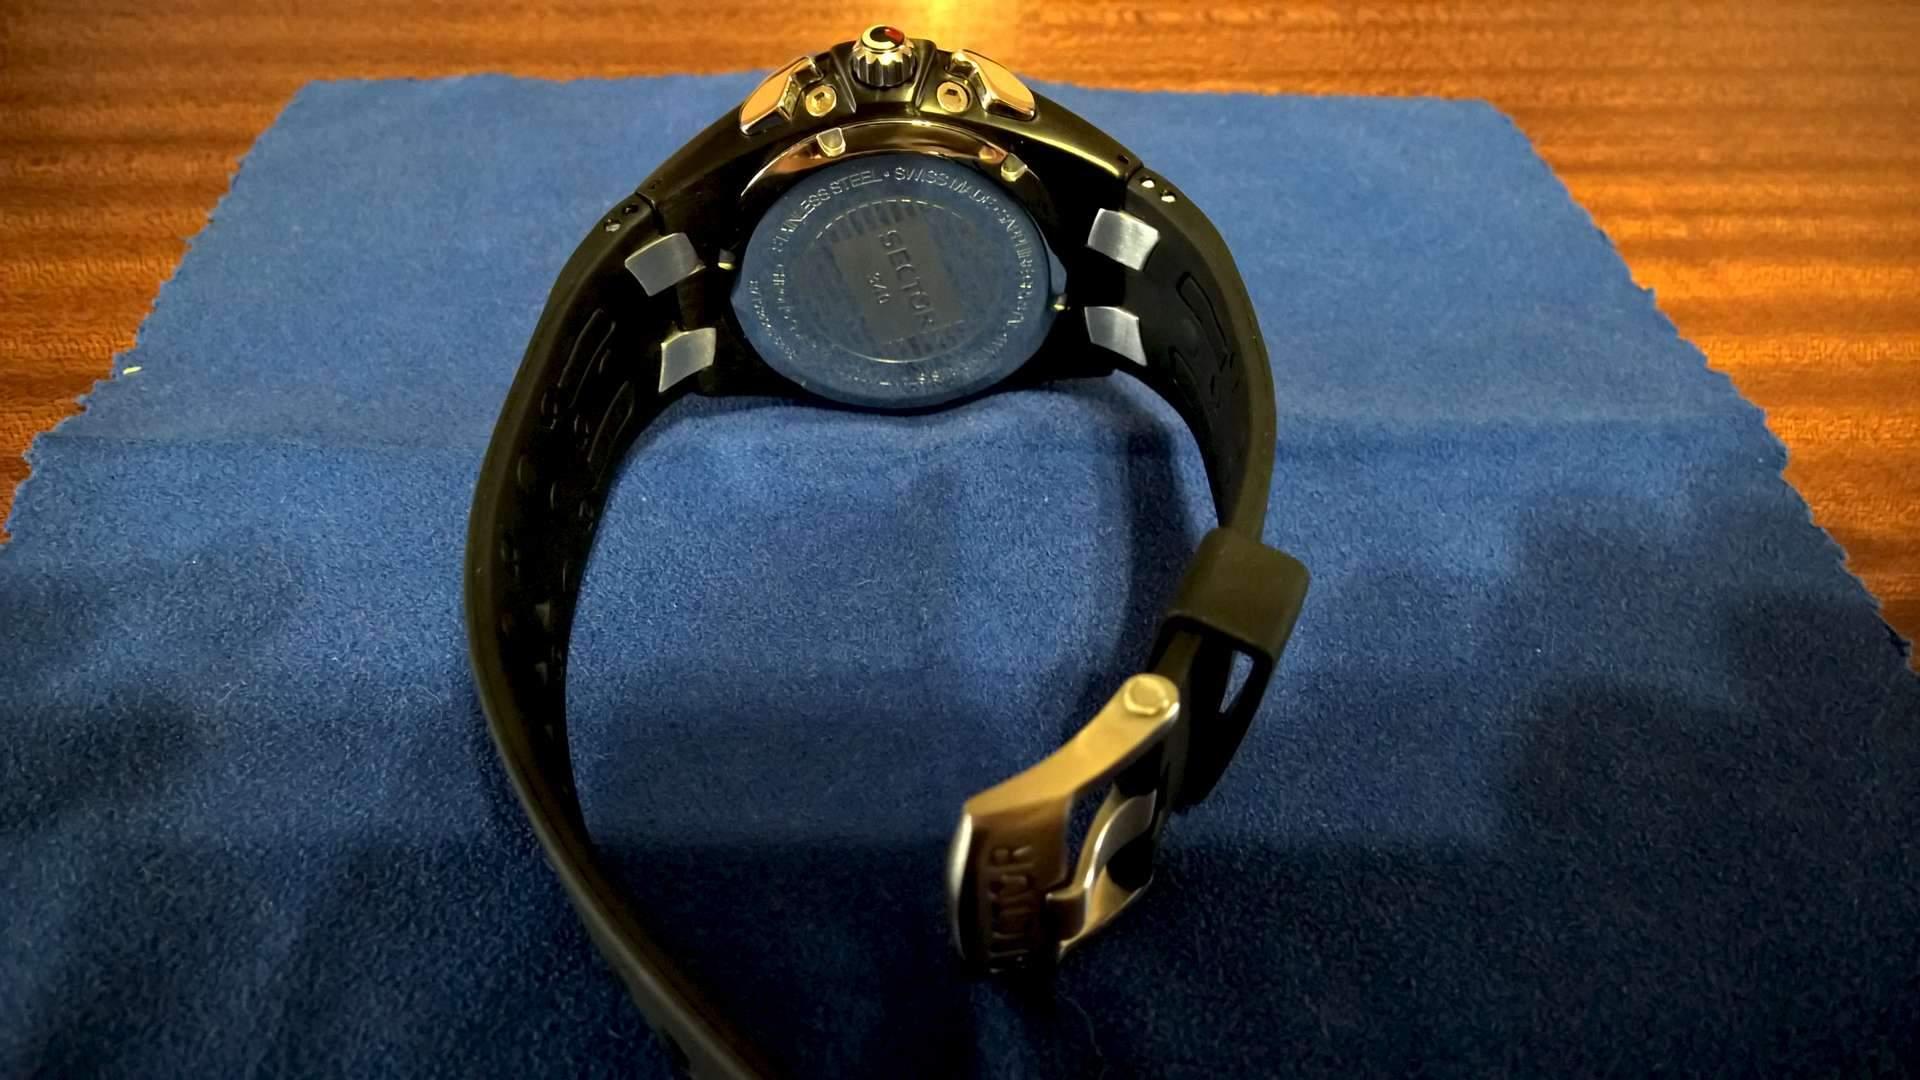 Breguet 4115 часы цена